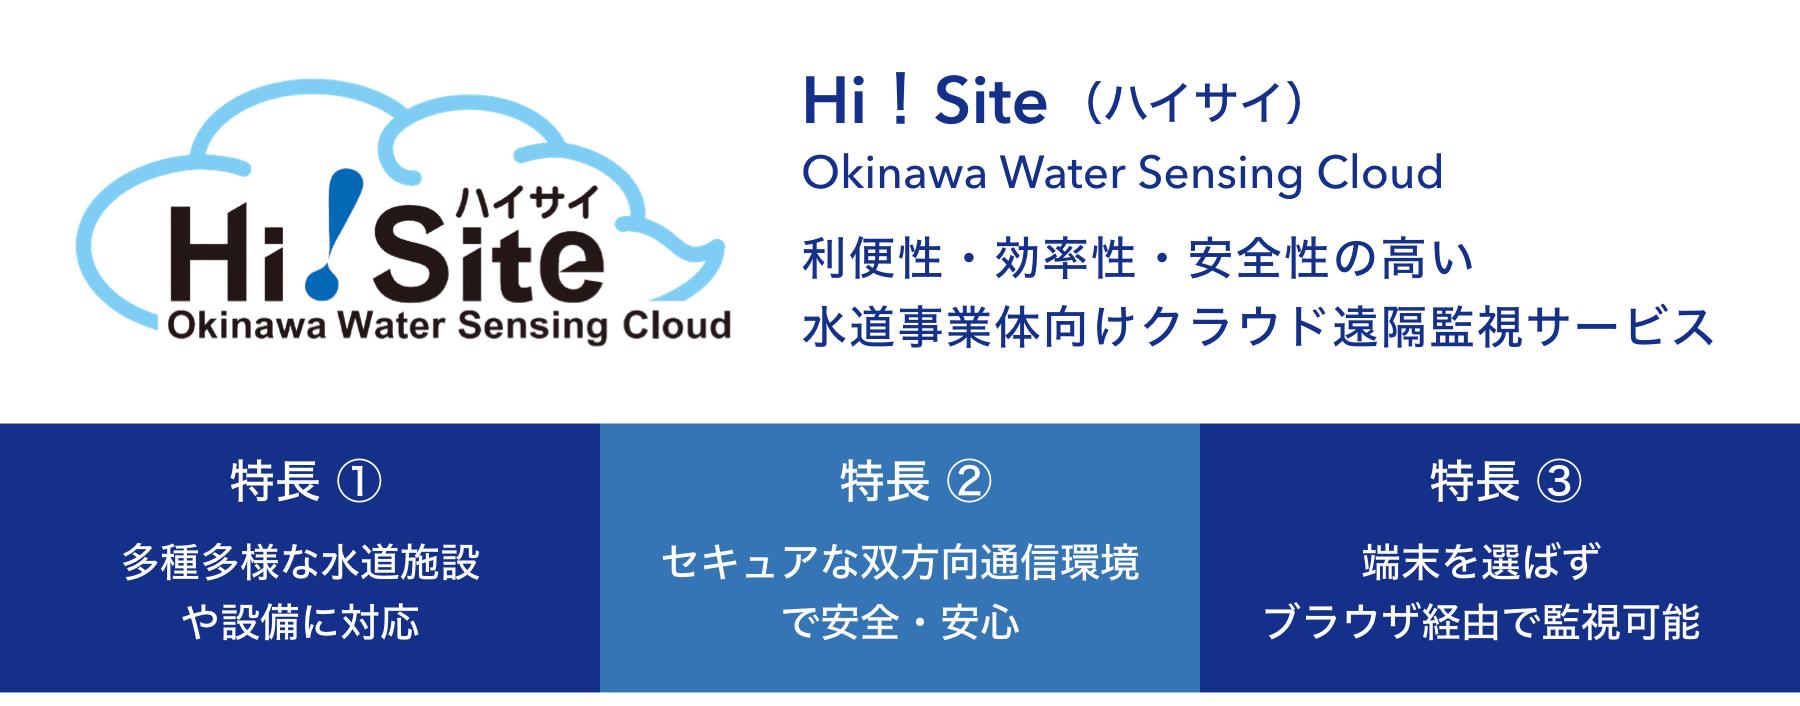 Hi!Site(ハイサイ) Okinawa Water Sensing Cloud 利便性・効率性・安全性の高い 水道事業体向けクラウド遠隔監視サービス 特徴1多種多様な水道施設や設備に対応 特徴2セキュアな双方向通信環境で安全・安心 特徴3端末を選ばずブラウザ経由で監視可能